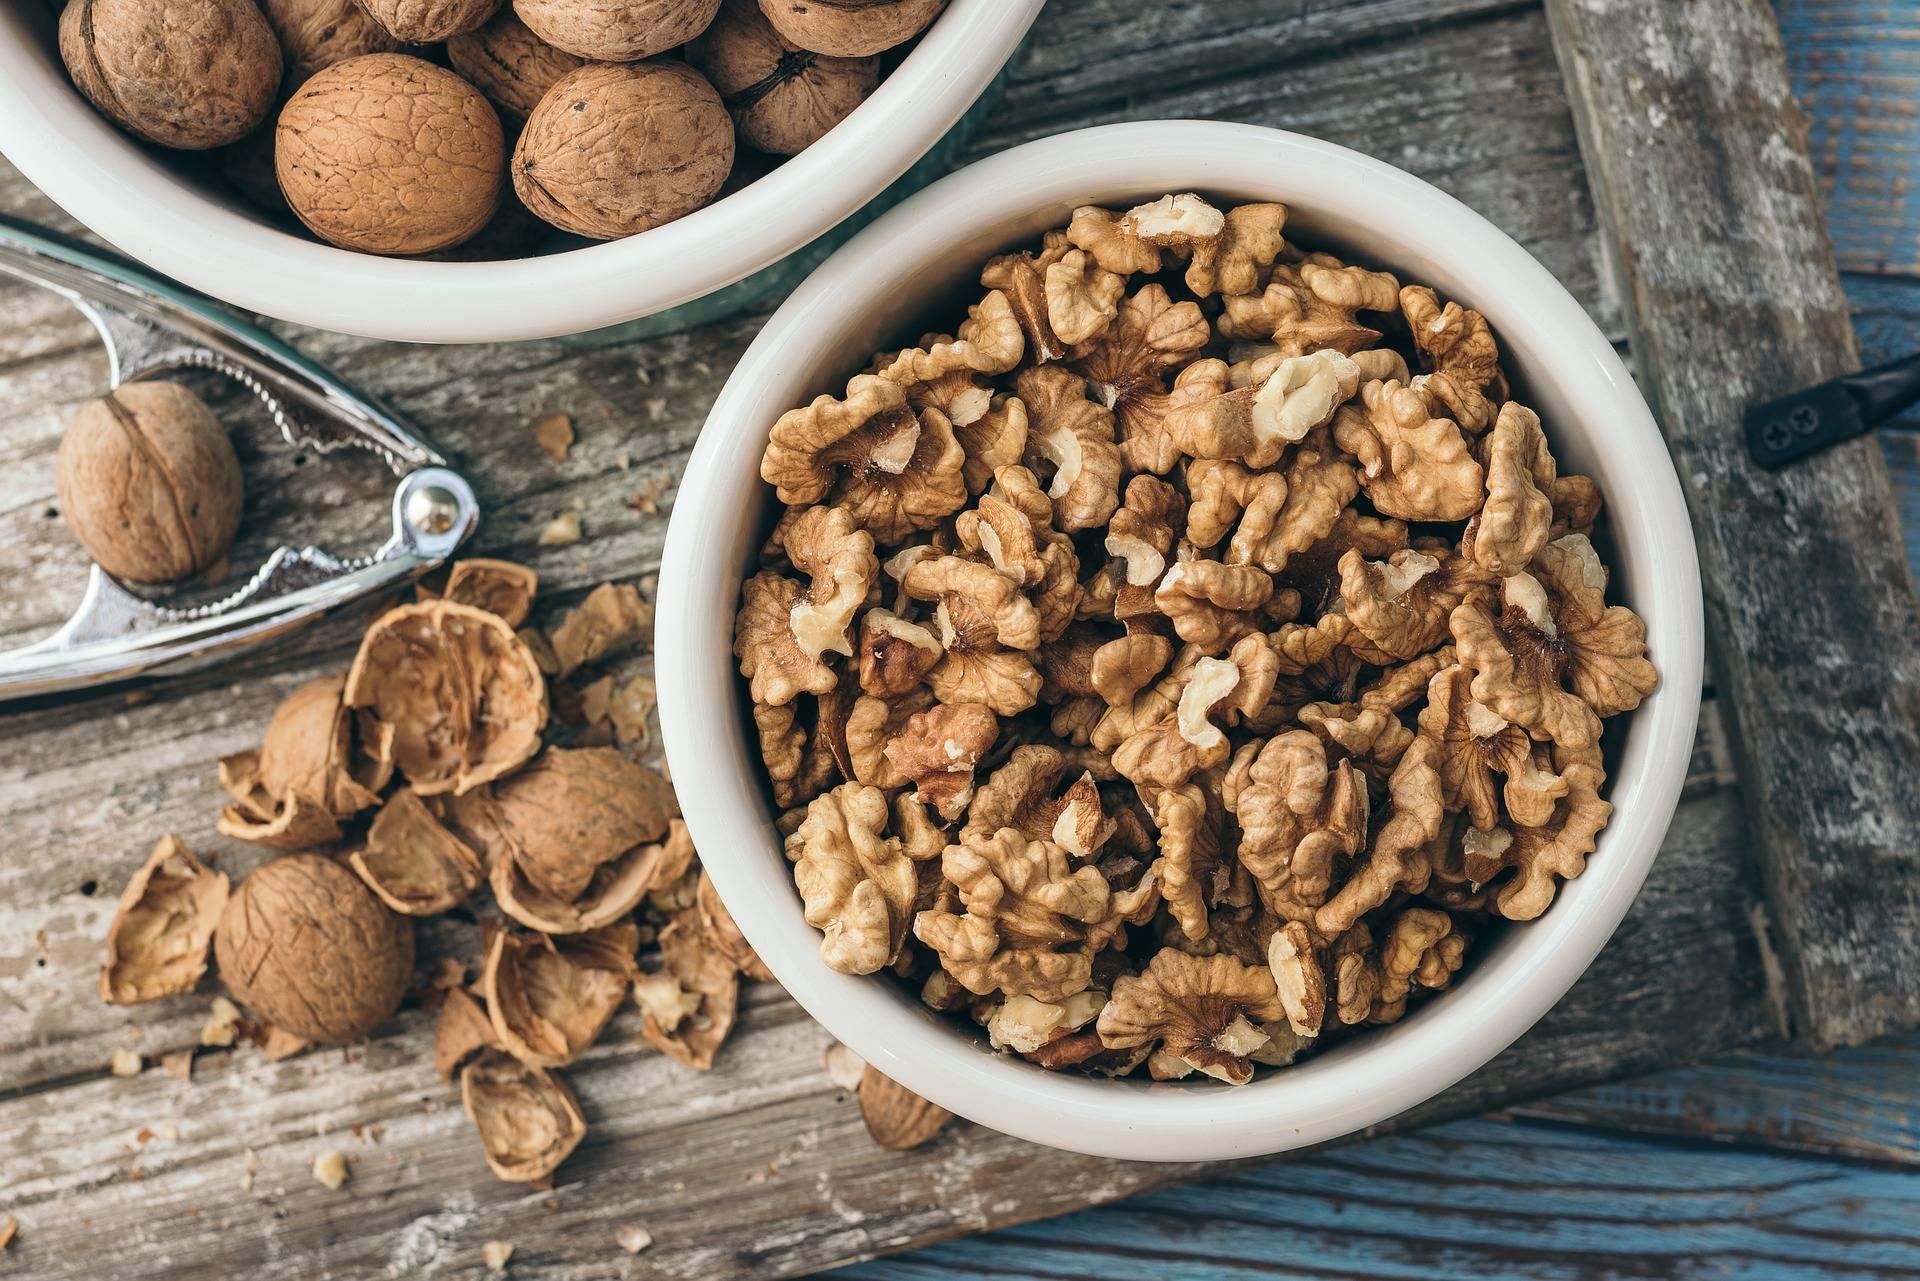 Как расколоть грецкий орех в домашних условиях и не повредить ядро